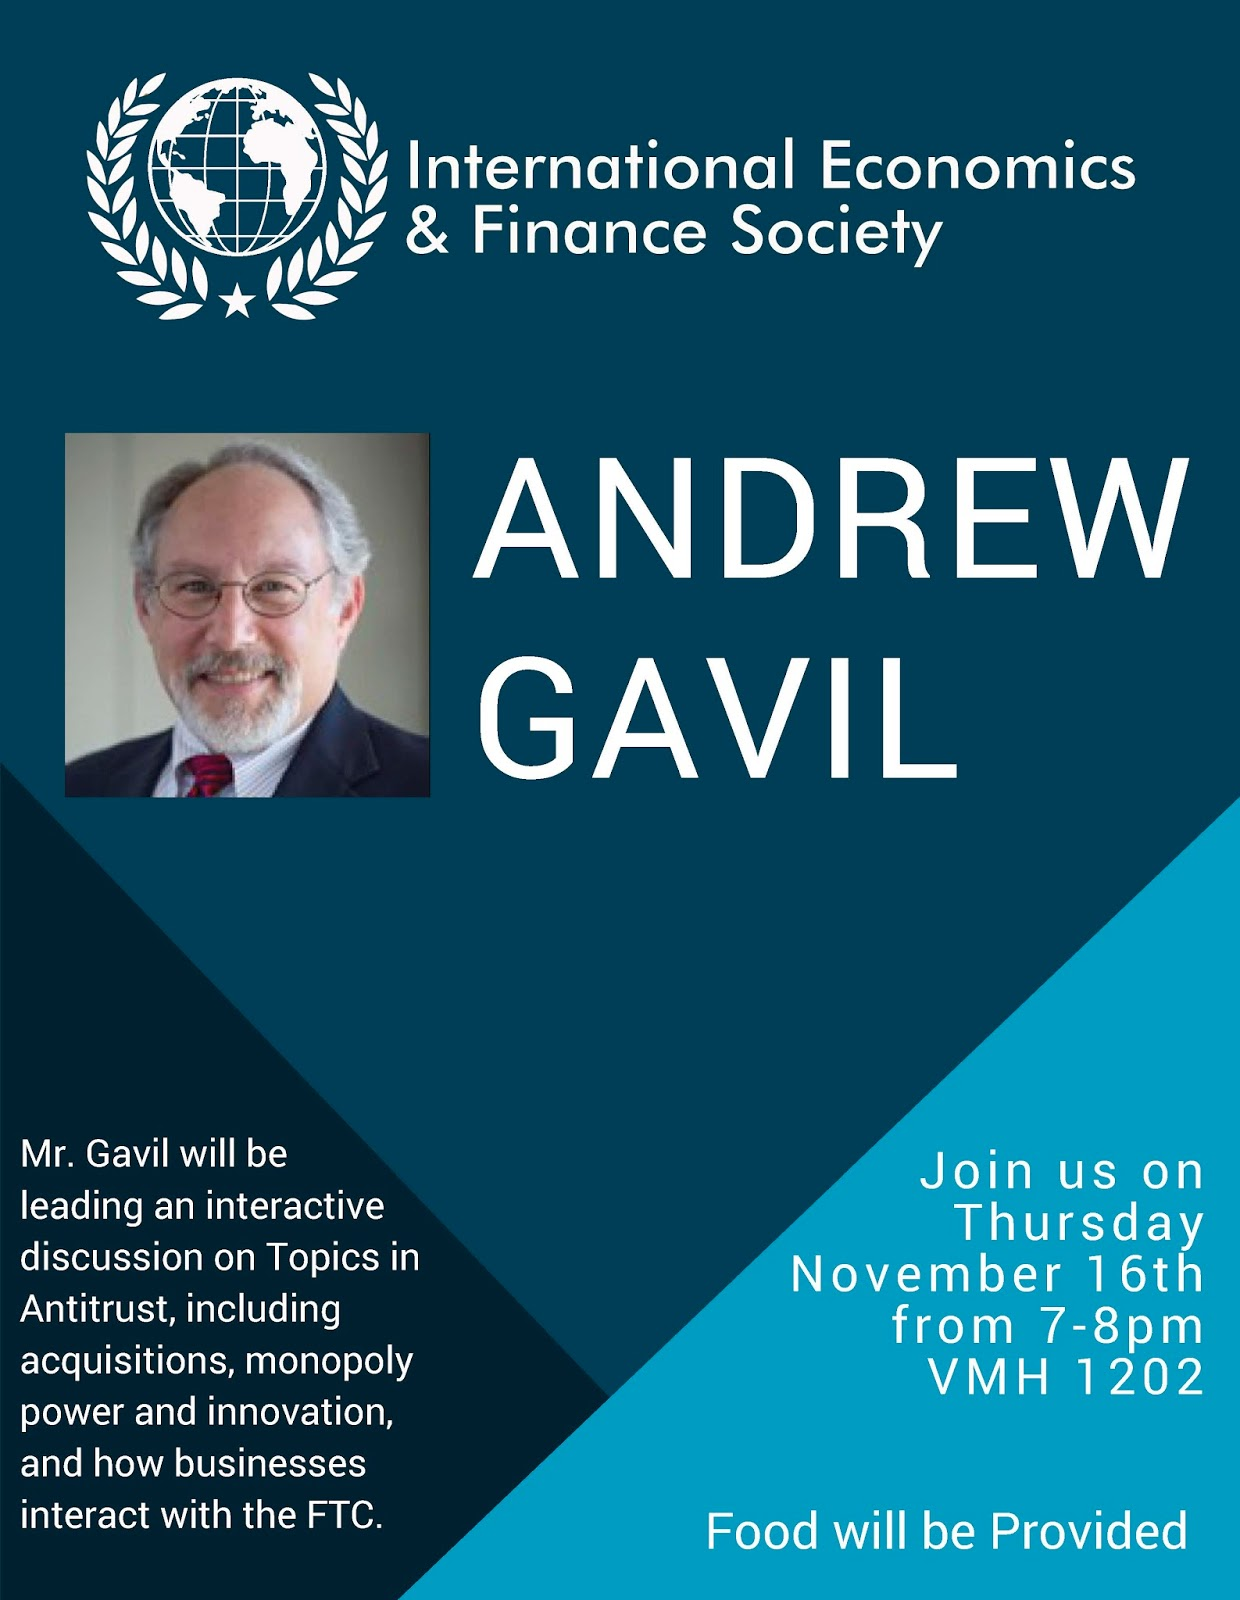 ECON Undergraduate Blog: International Economics & Finance Society